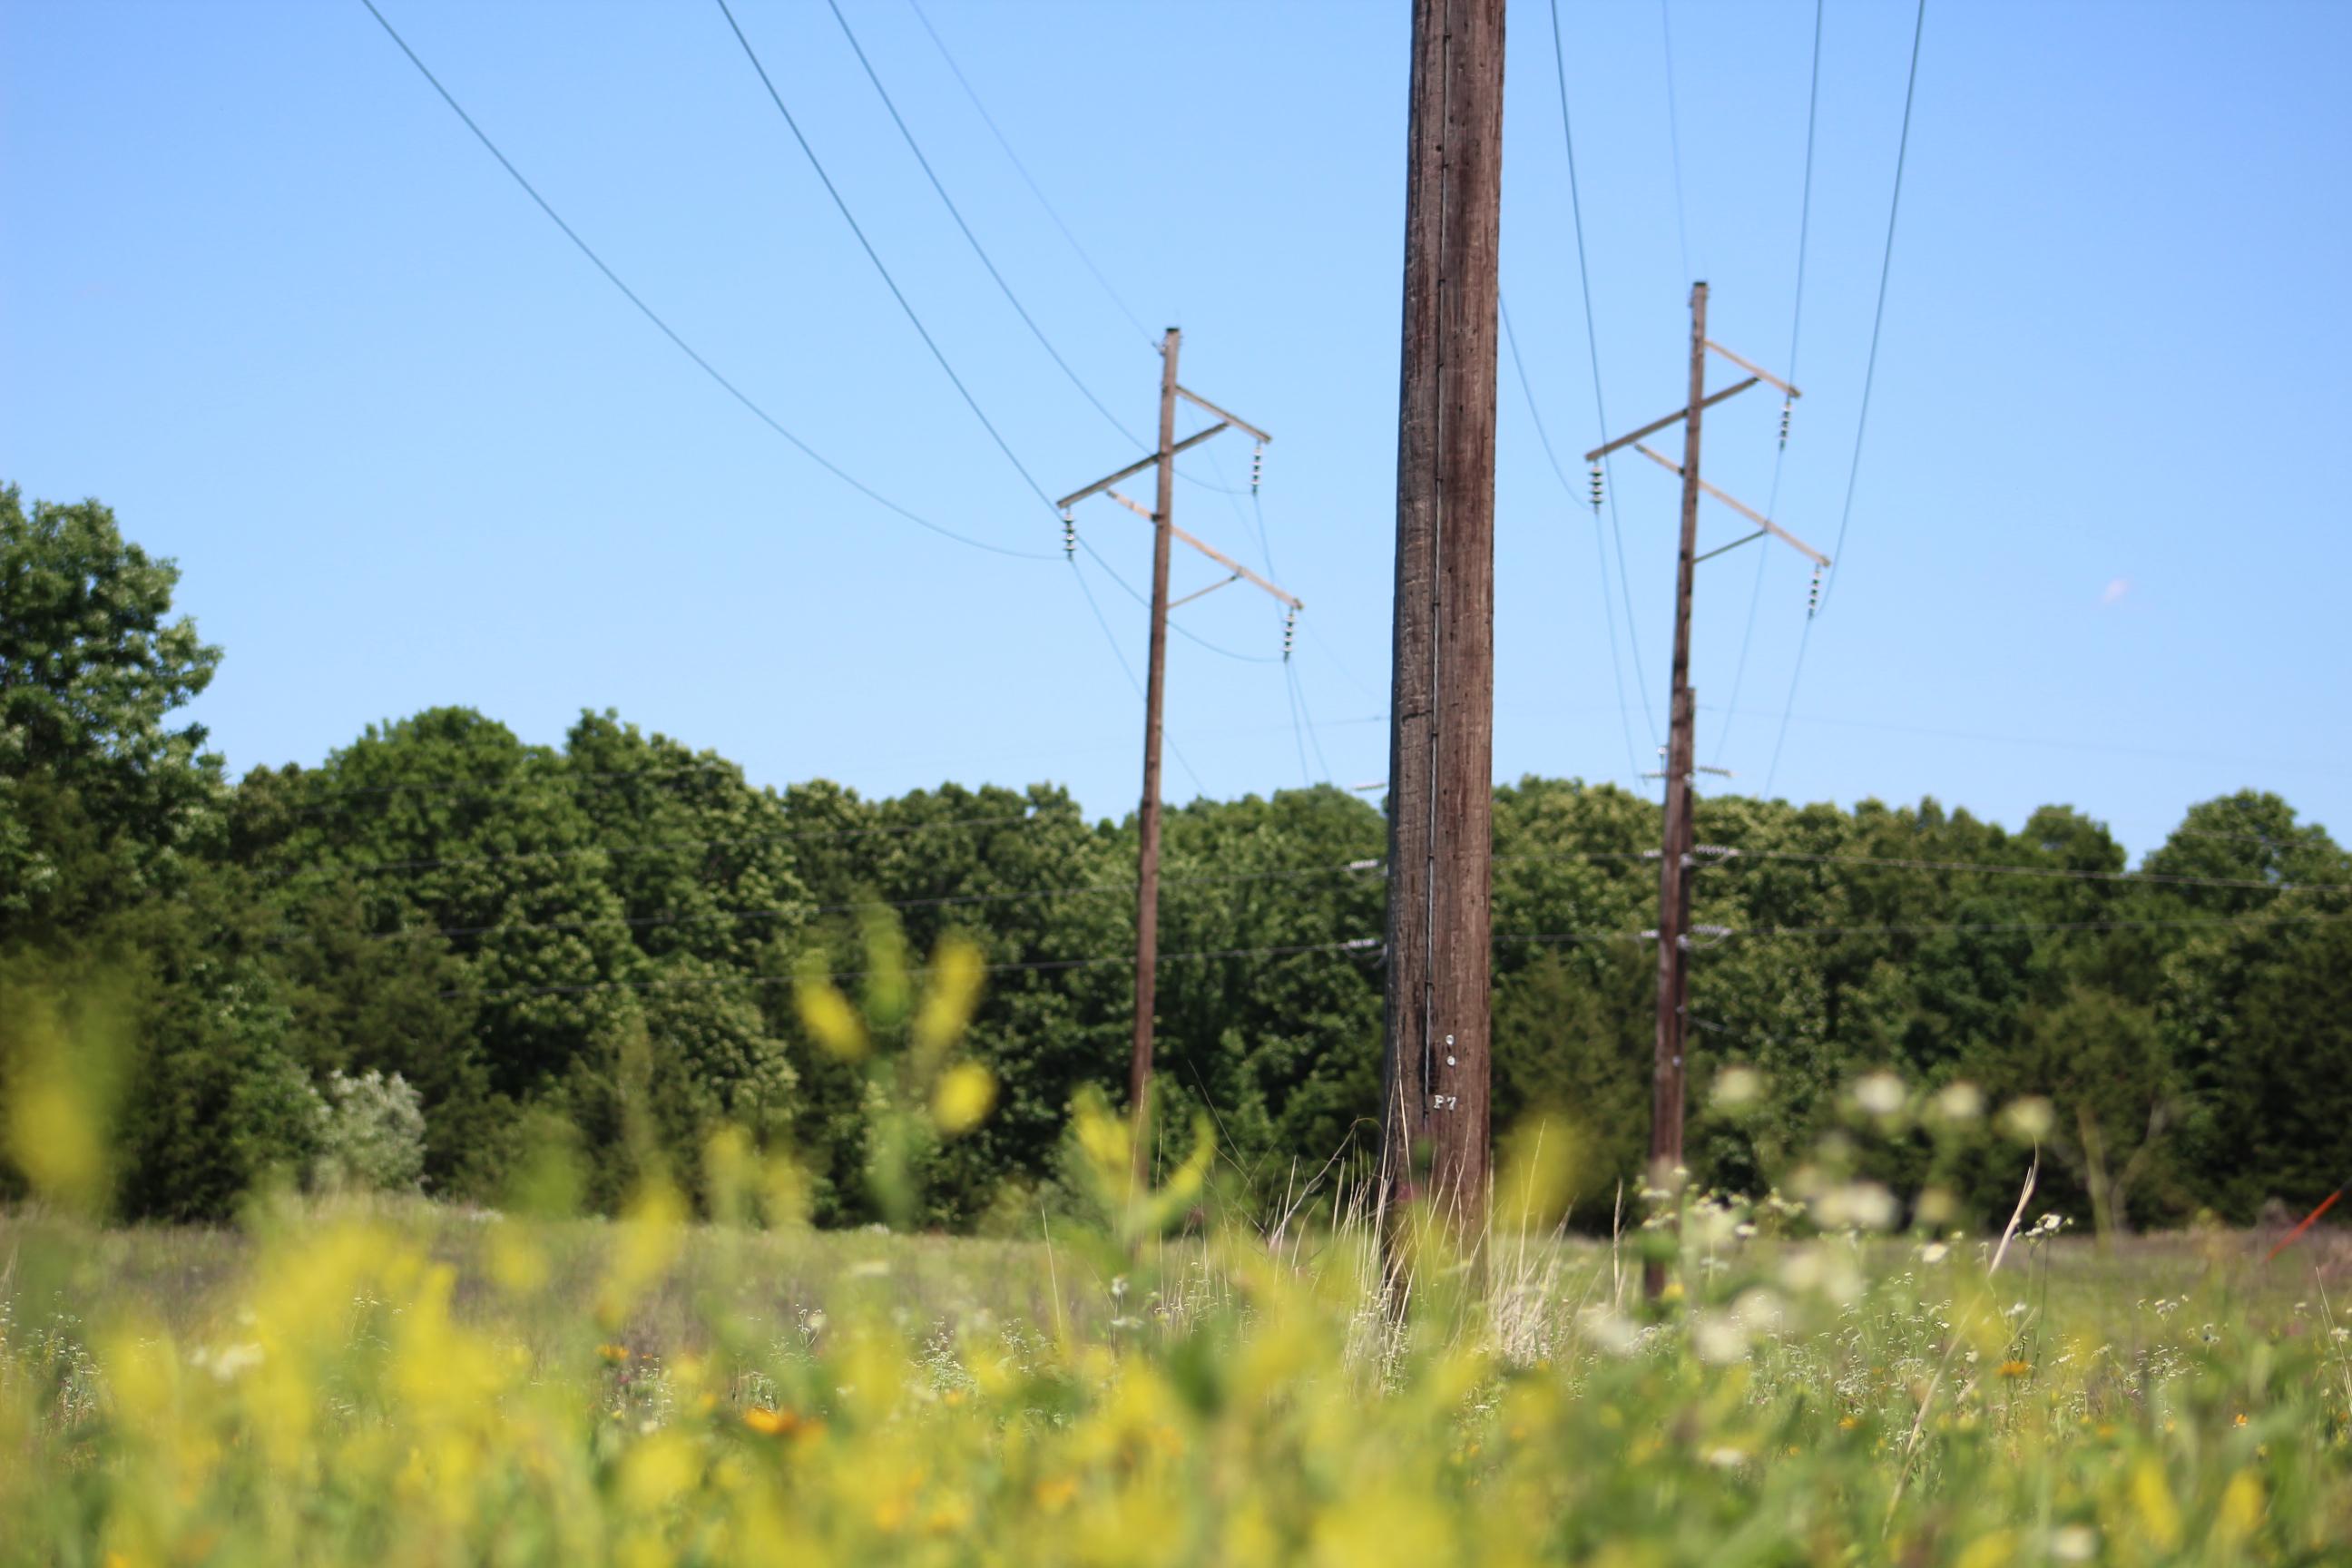 https://northeast-power.coop/sites/northeastpower/files/revslider/image/IMG_7975.JPG